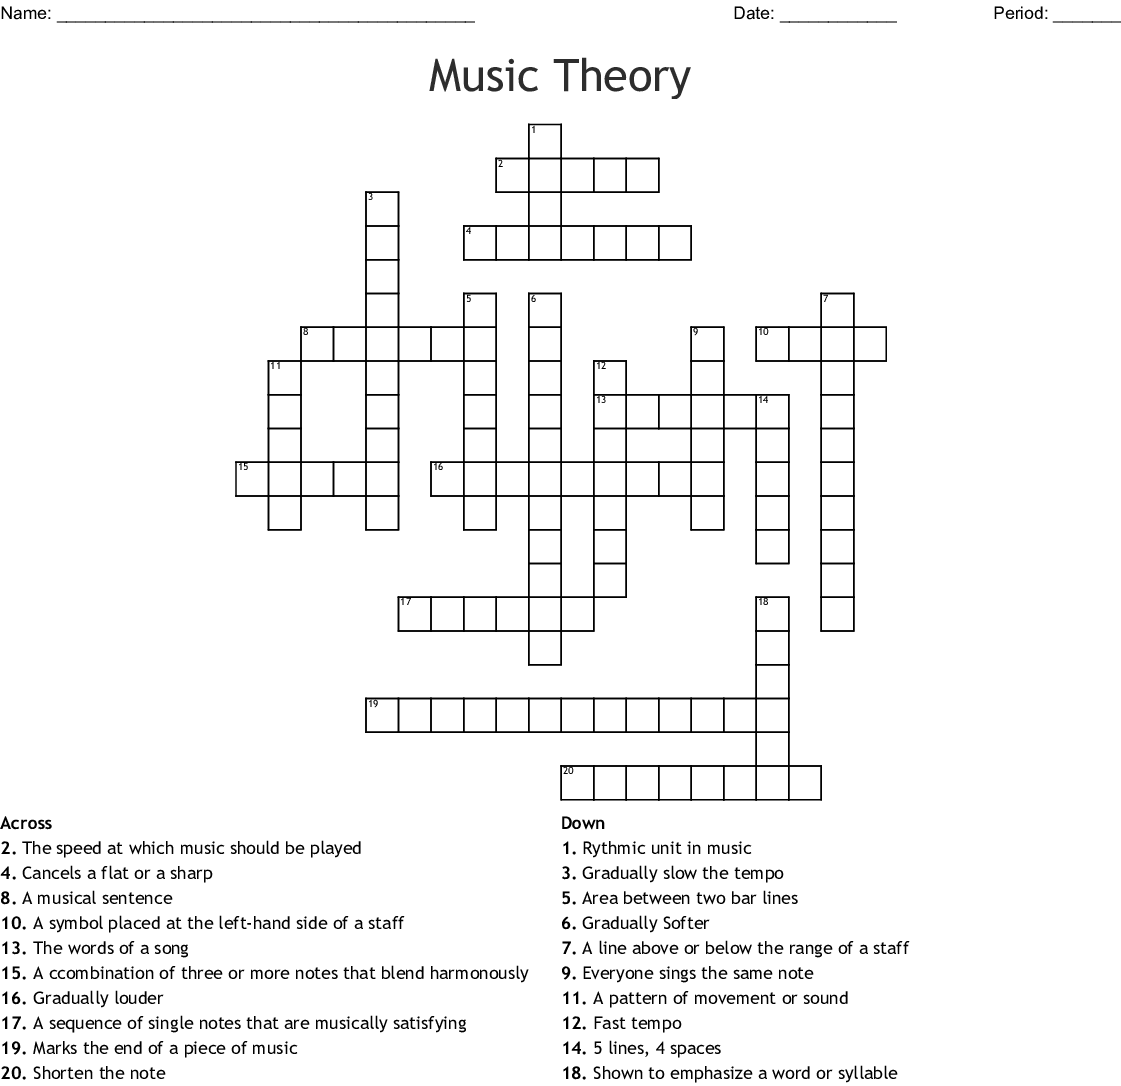 Music Theory Crossword